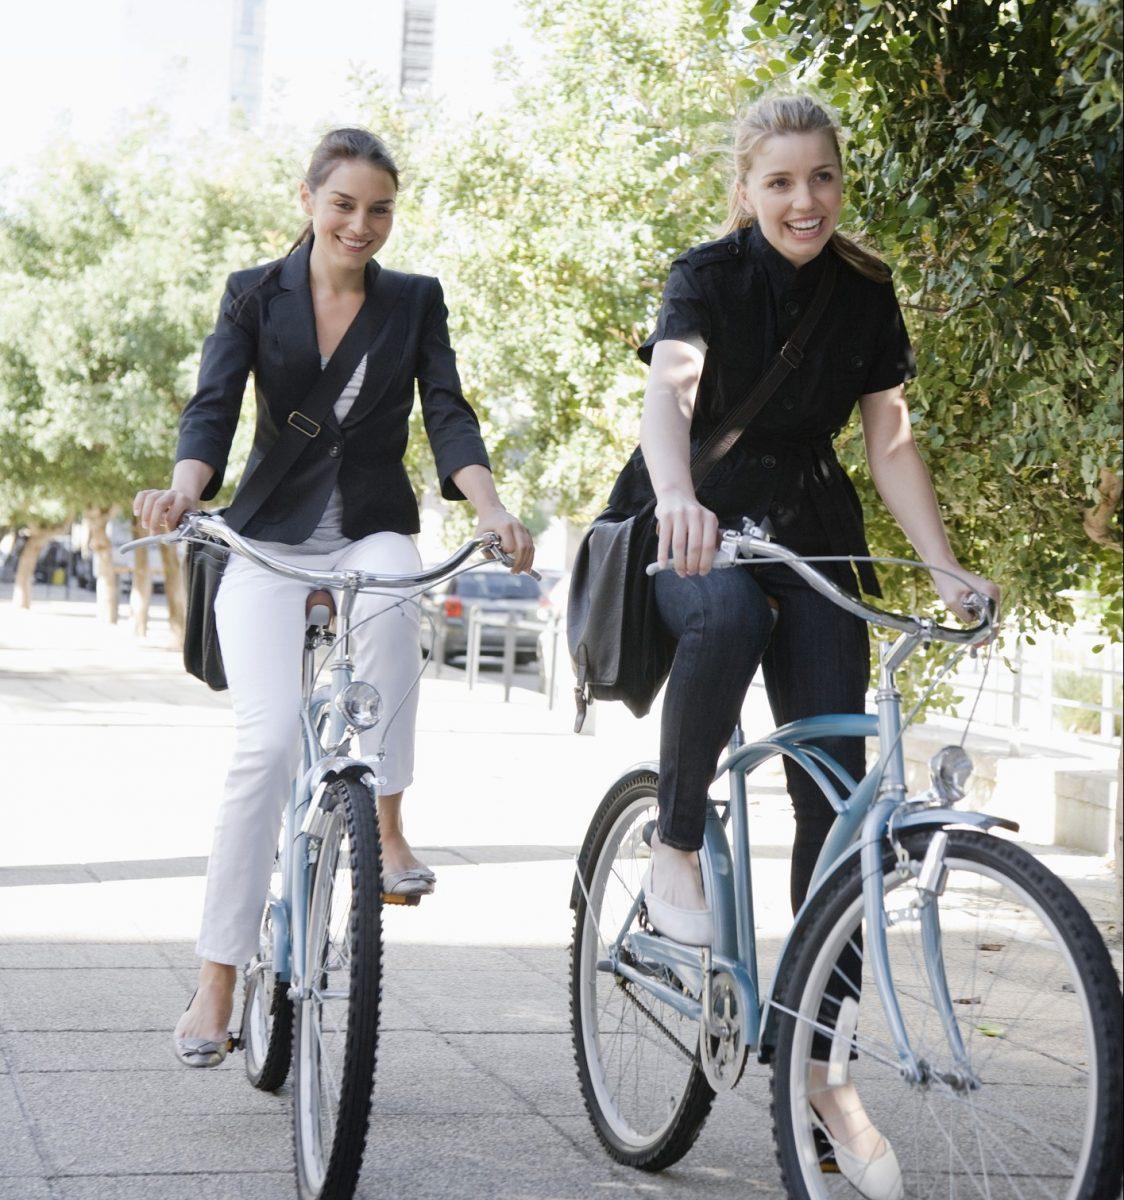 Businesswomen riding bicycles